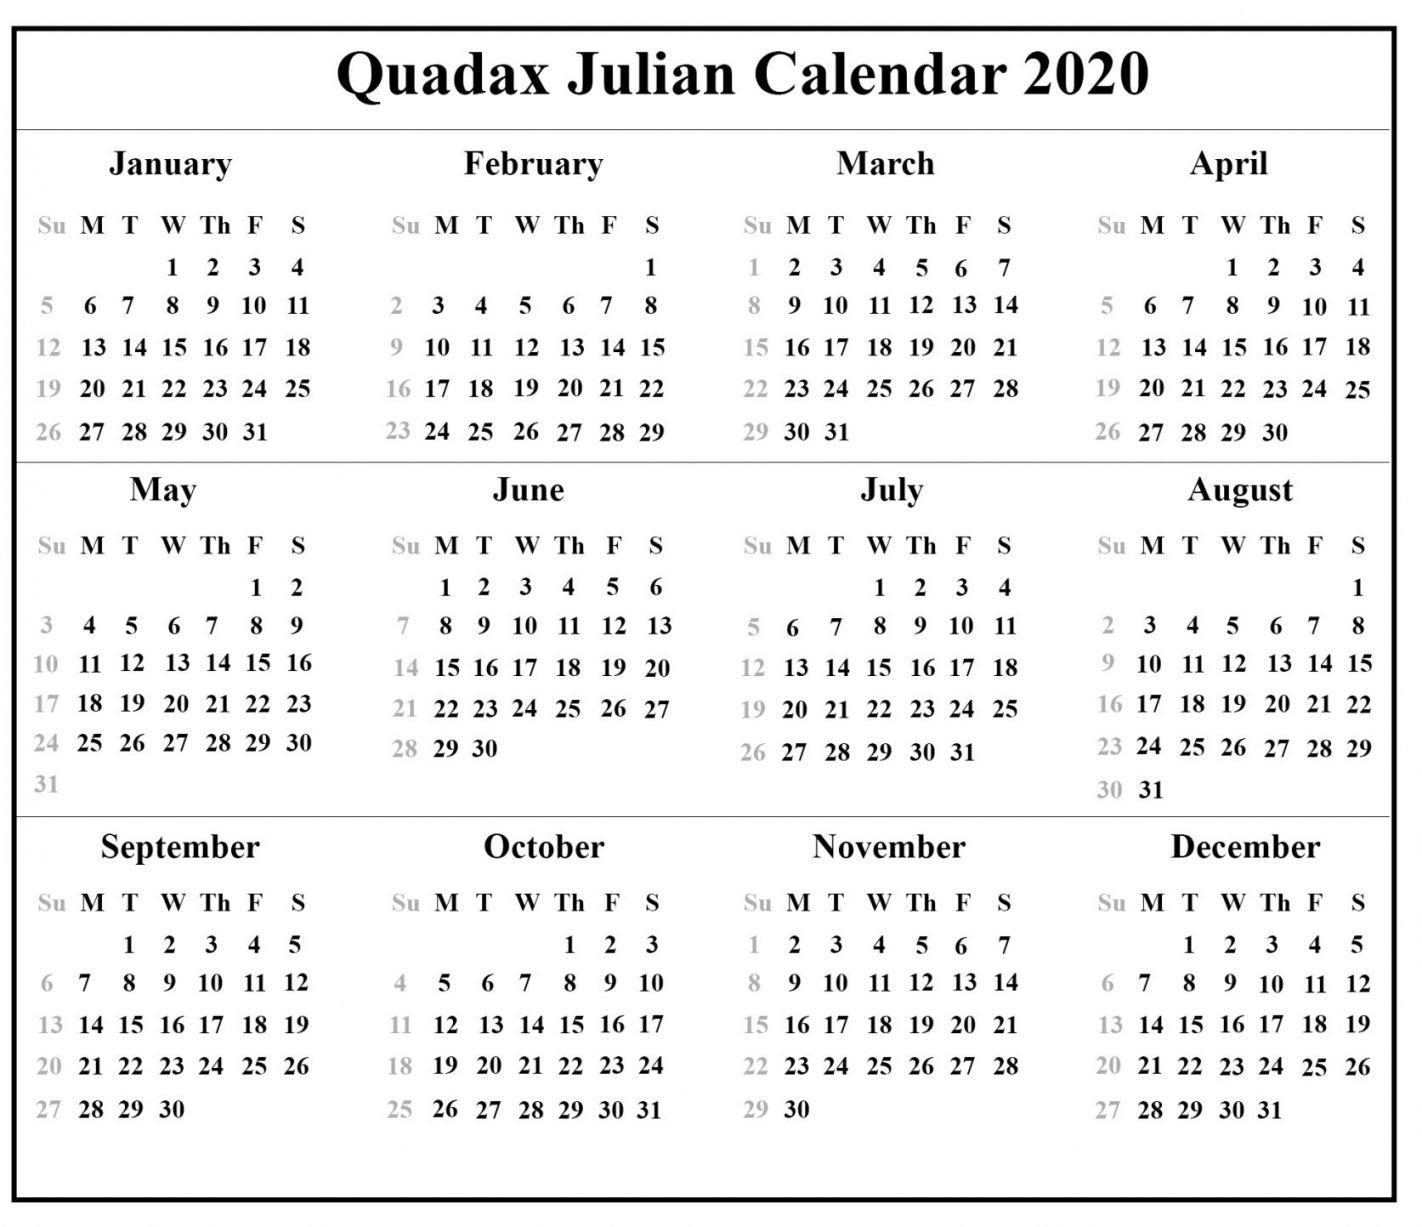 Printable 2021 Julian Calendar In 2020 | Calendar Template with 2021 Julian Calendar